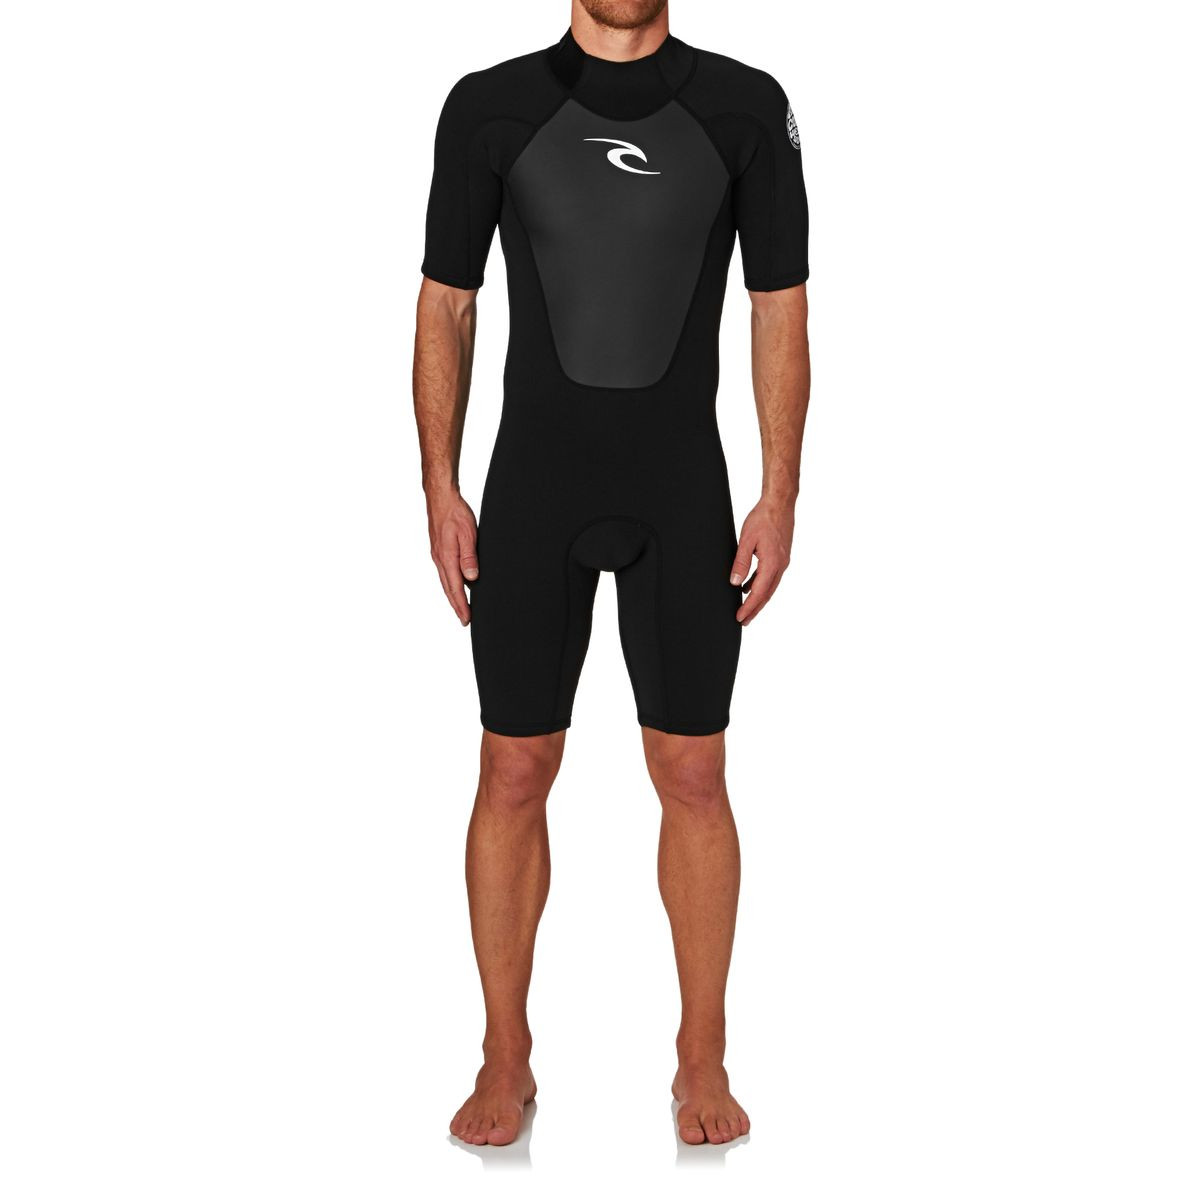 Rip Curl Omega 1.5mm 2017 Back Zip Short Sleeve Shorty Wetsuit - Black